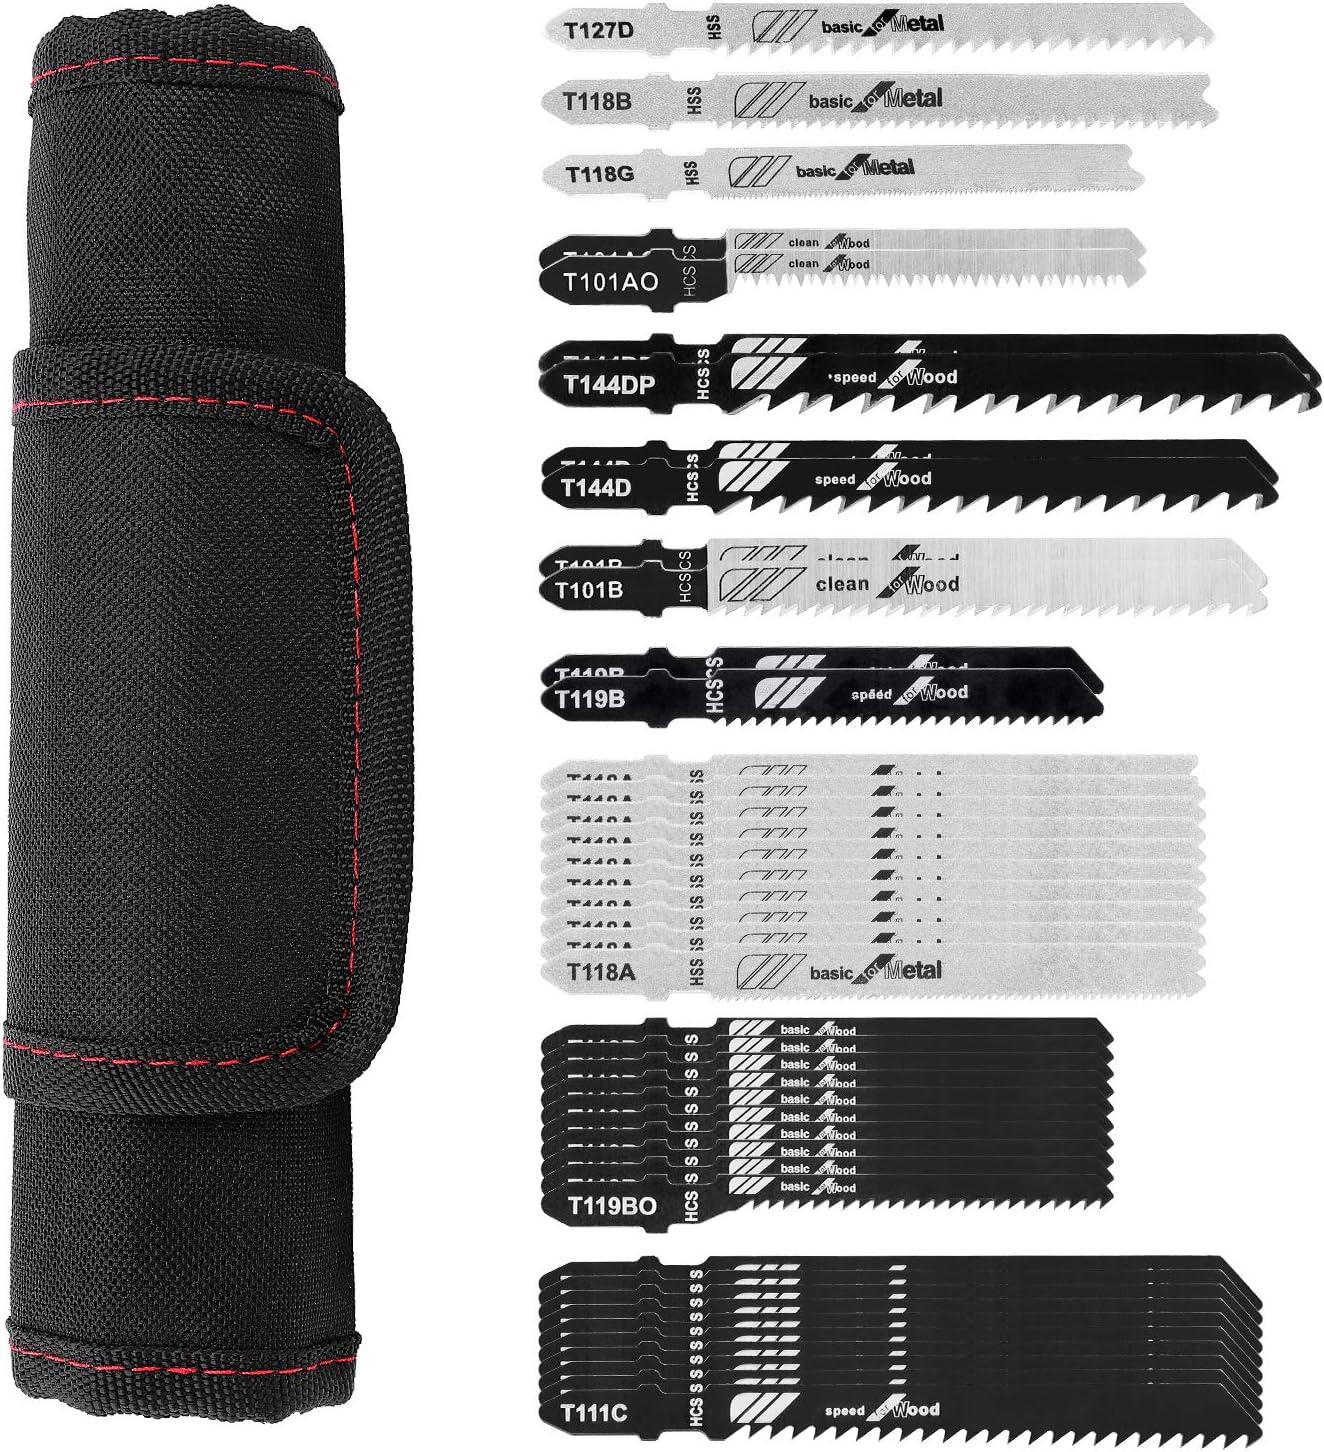 Makita Milwaukee etc Dewalt FIXKIT 43-Piece Jigsaw Blades T101B T111C T144D T144DP T101AO T119BO T119B T118A T127D T118B T118G Mixed Jigsaw Blades Set for Bosch